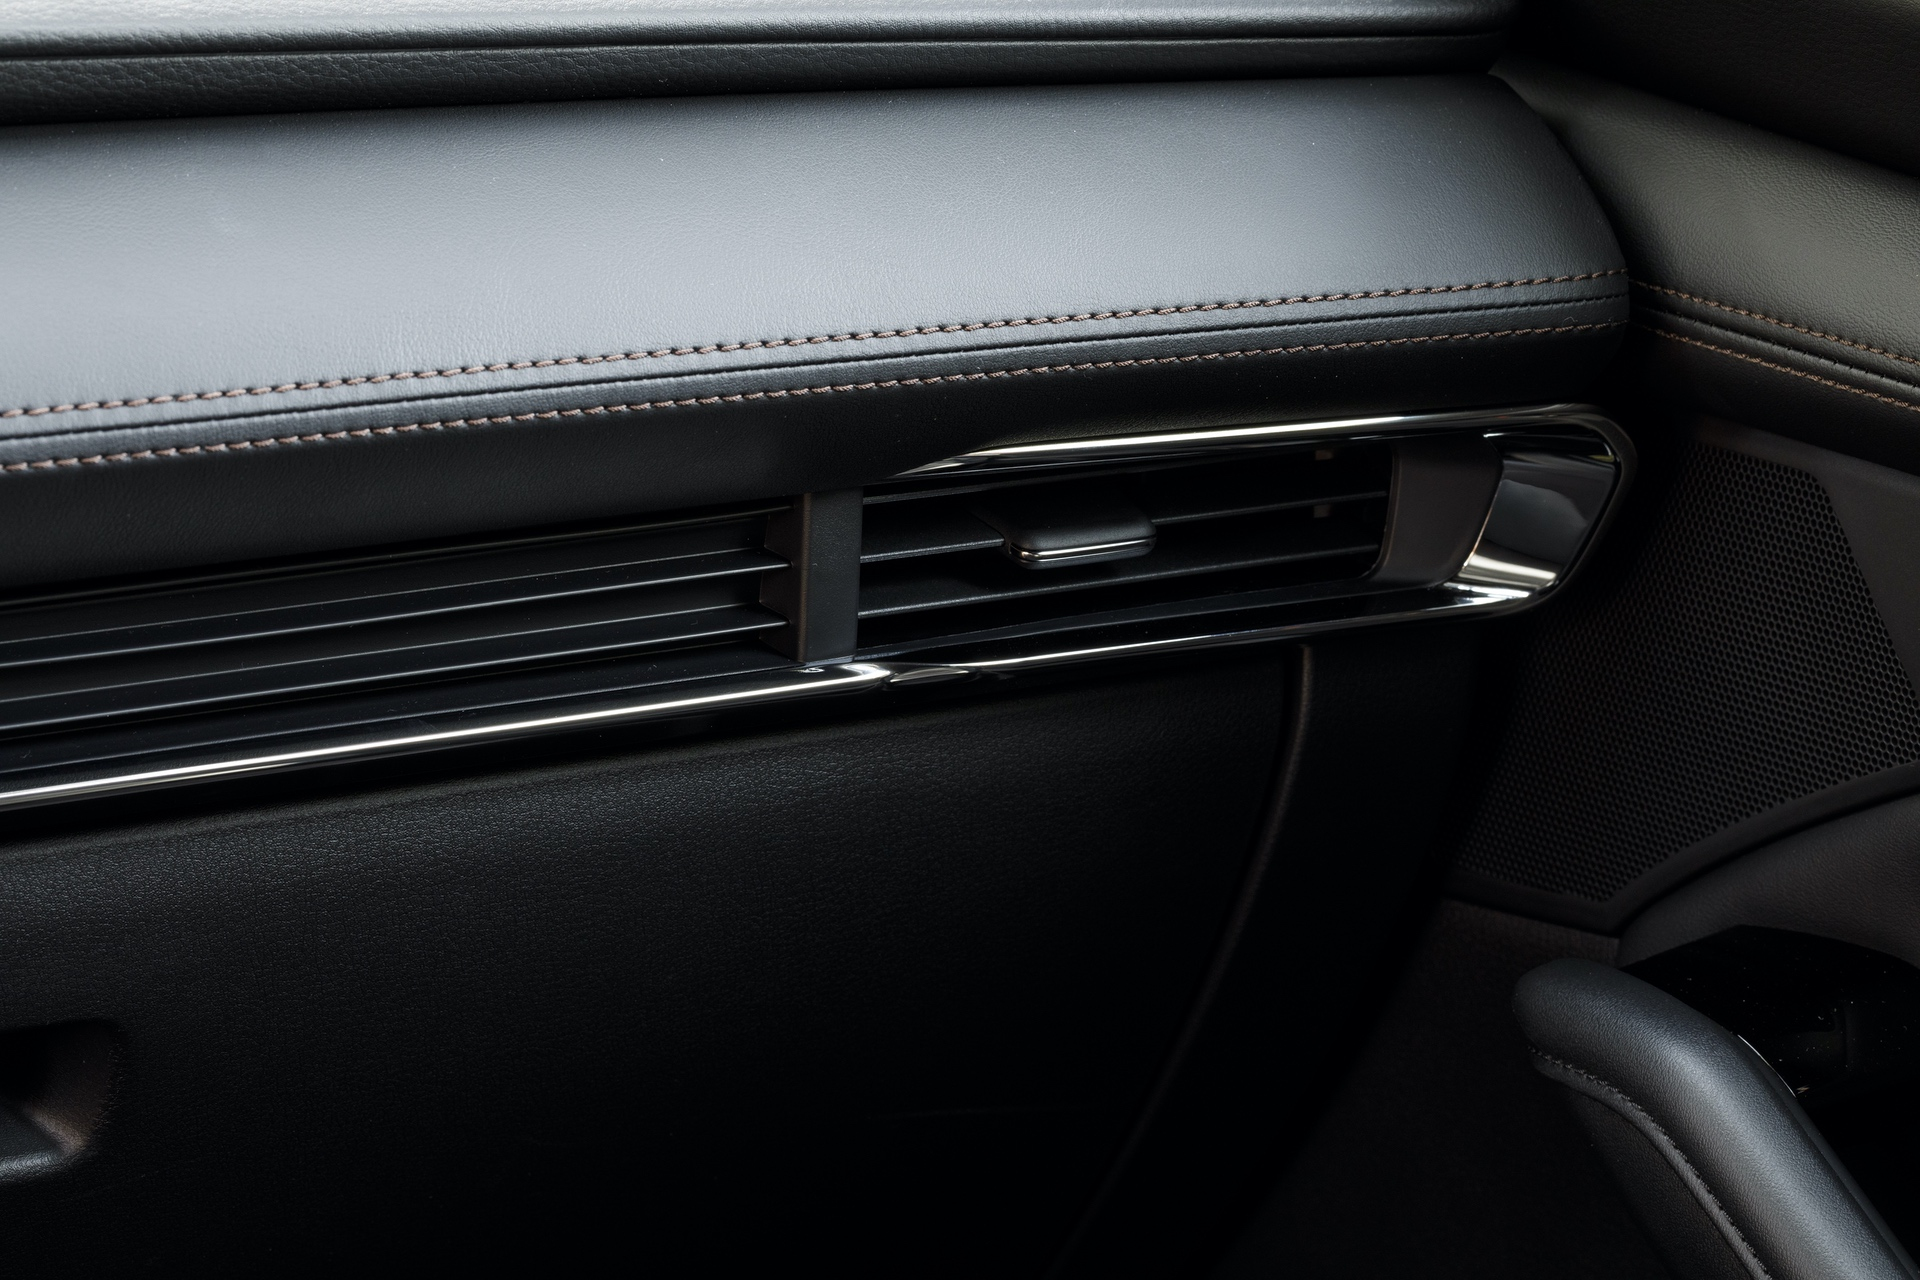 2019-Mazda3-Hatchback_33